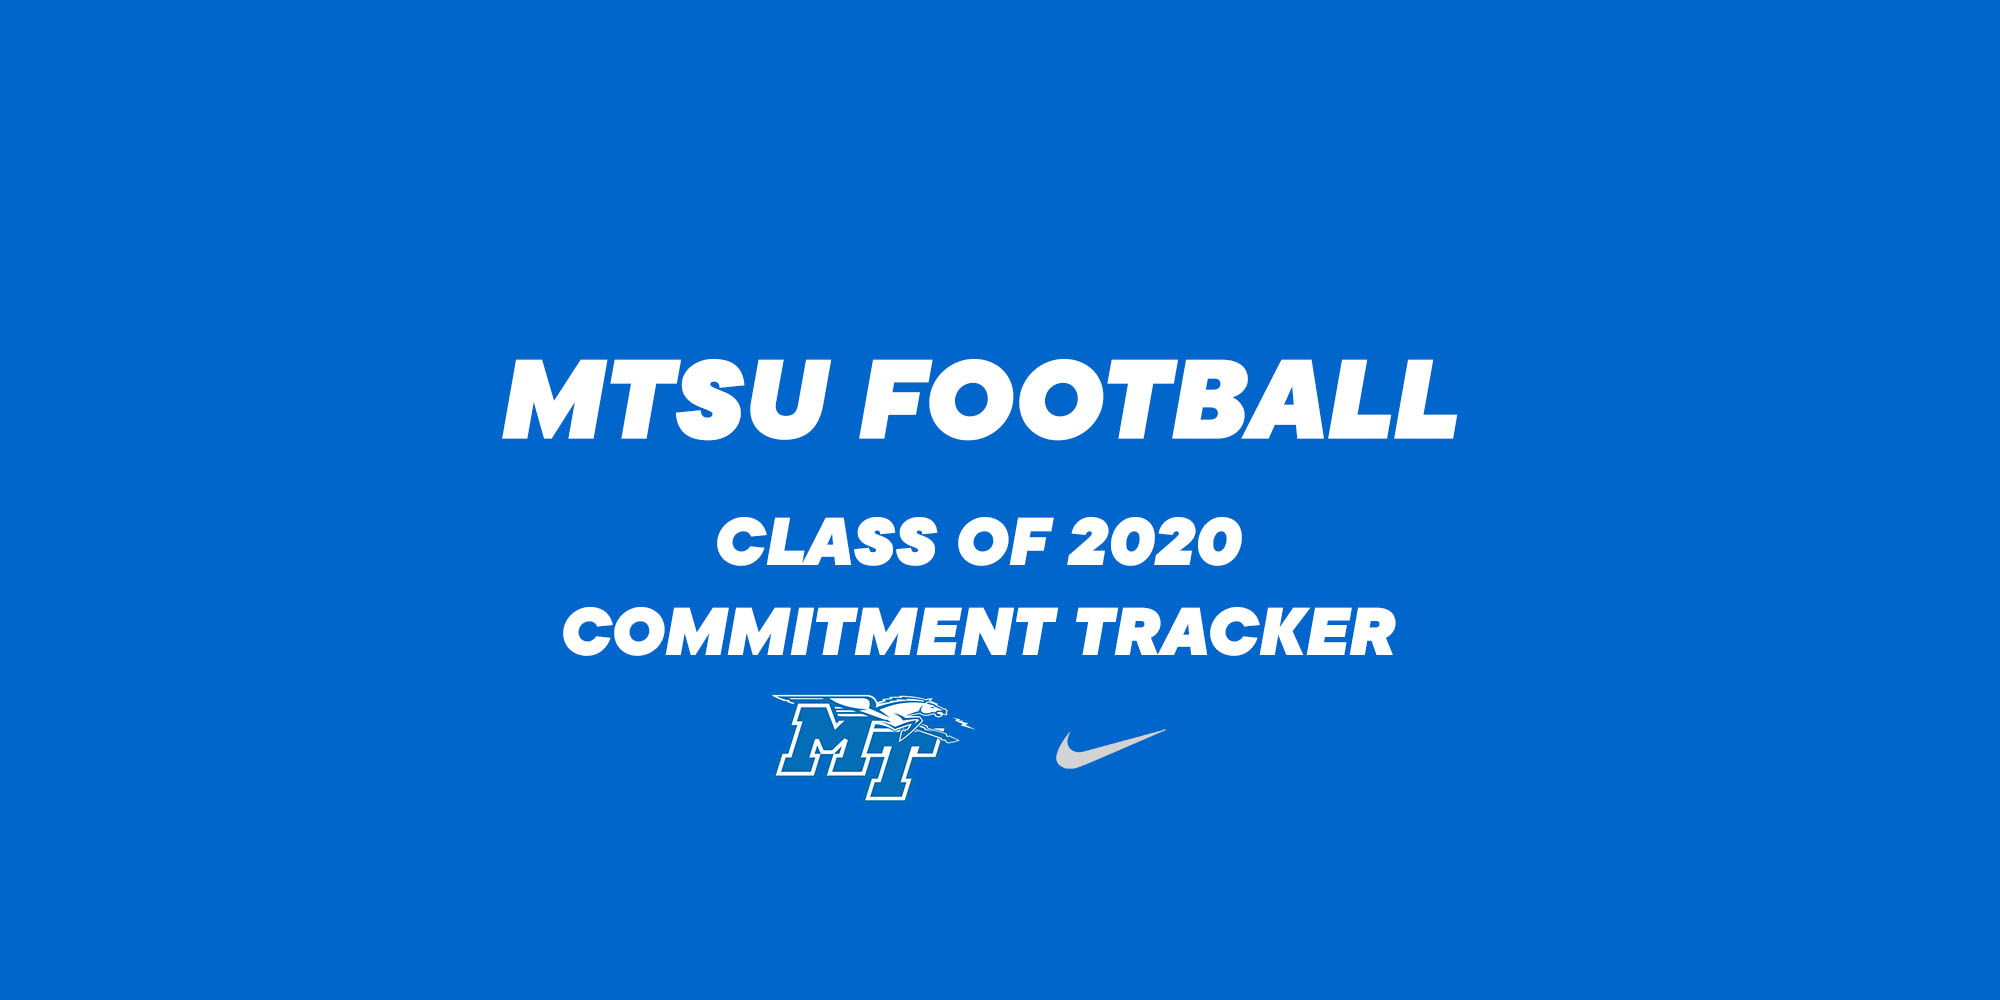 MTSU Football 2020 Commitment Tracker